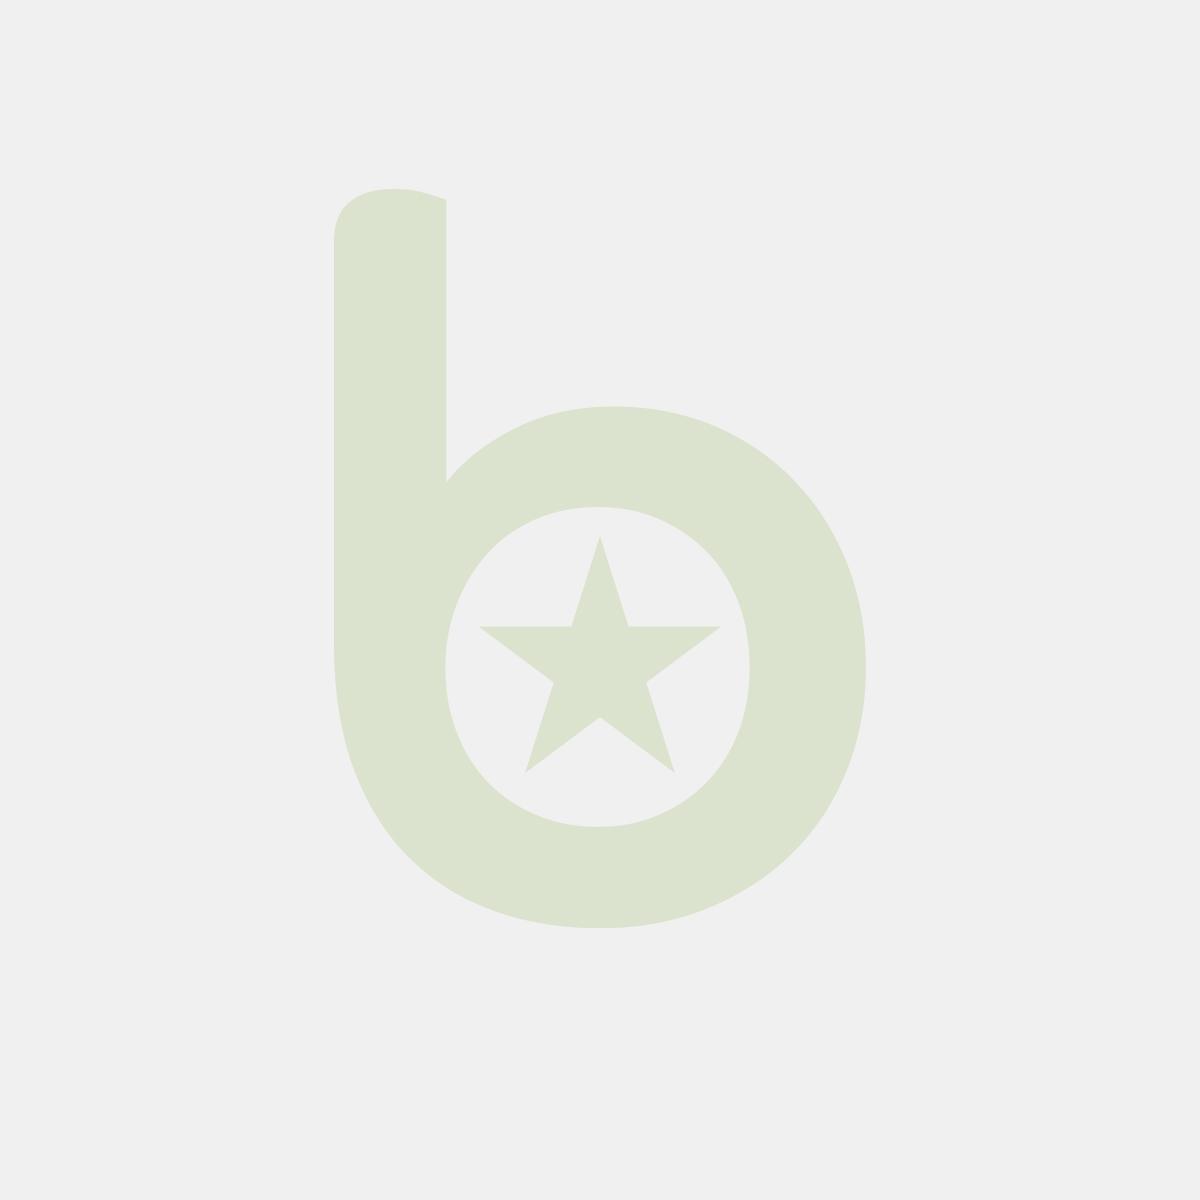 Koszyk Prestige Maxi prostokątny GN1/1 PP 52,5x32,5xh8cm, naturalny